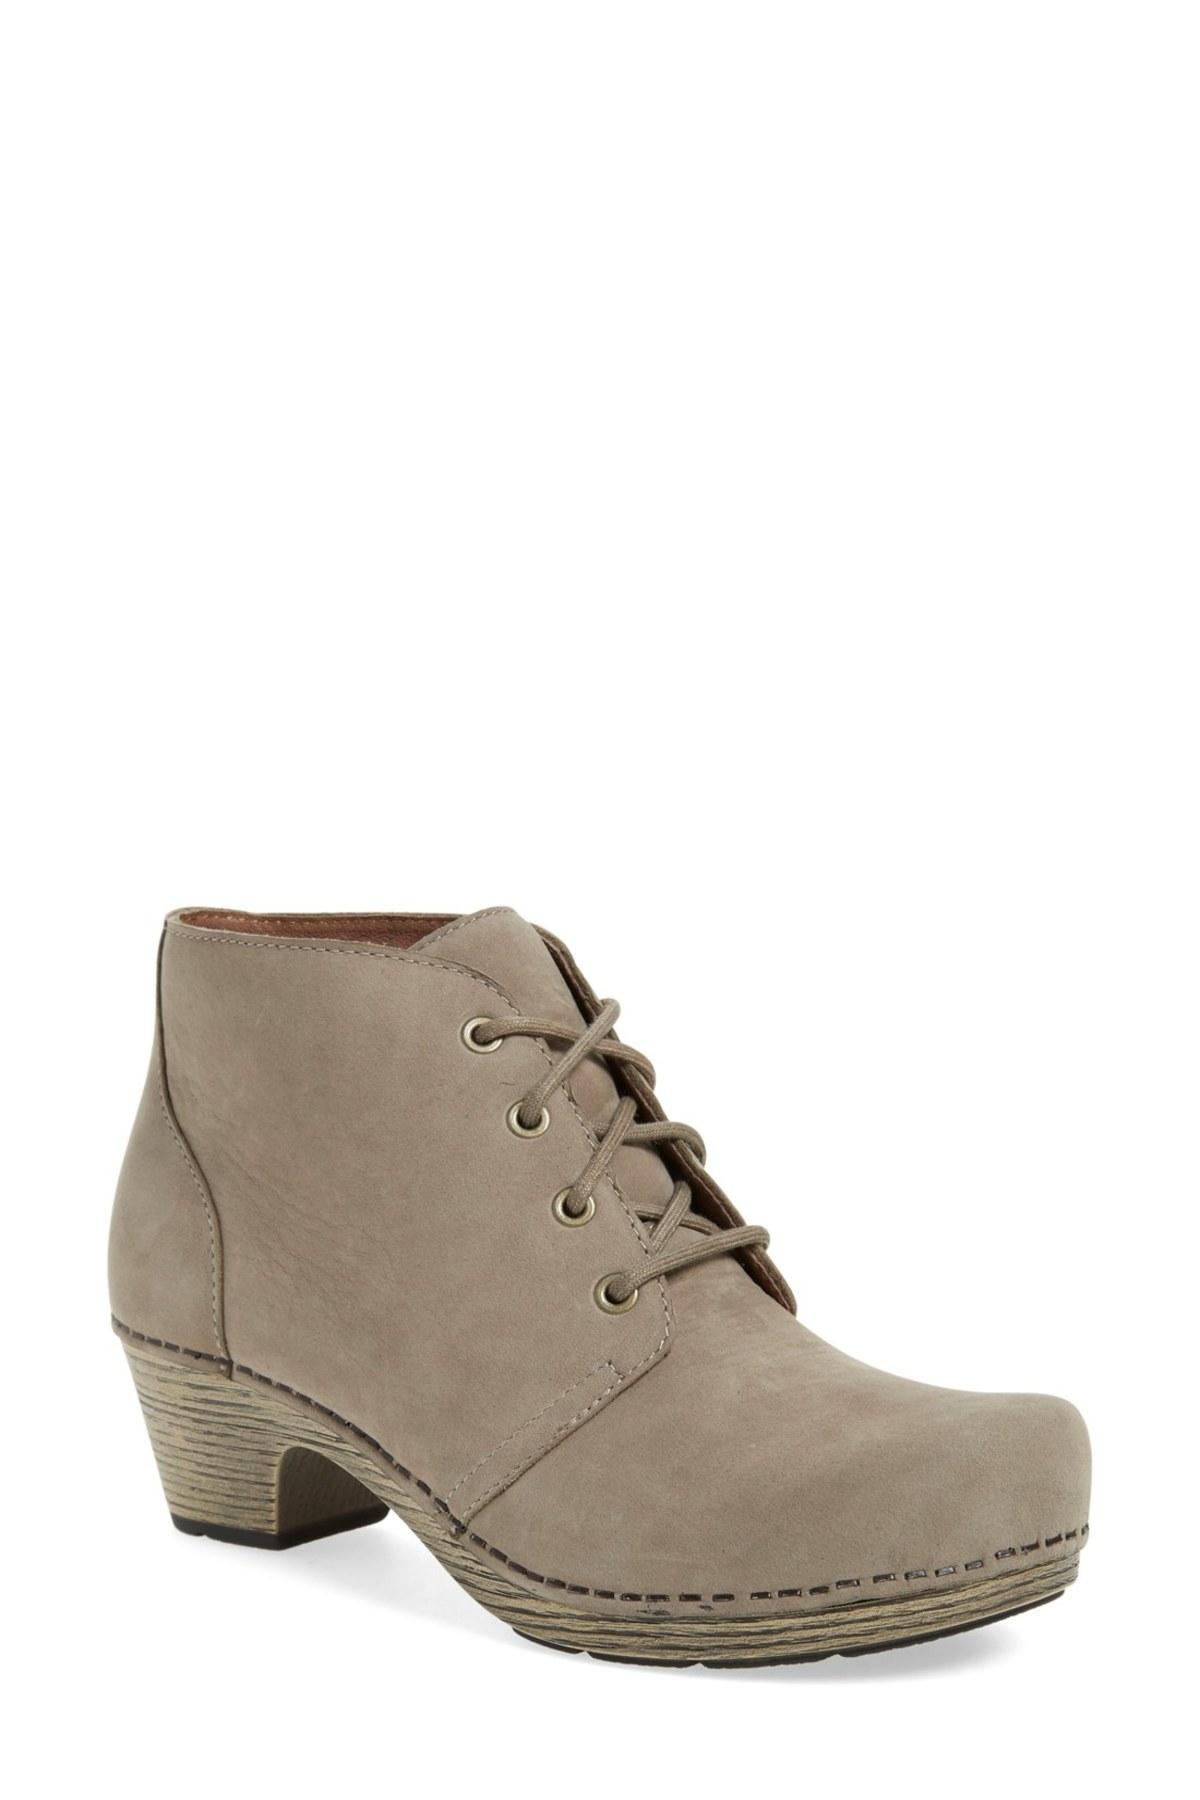 Dansko Shoes Richmond Va